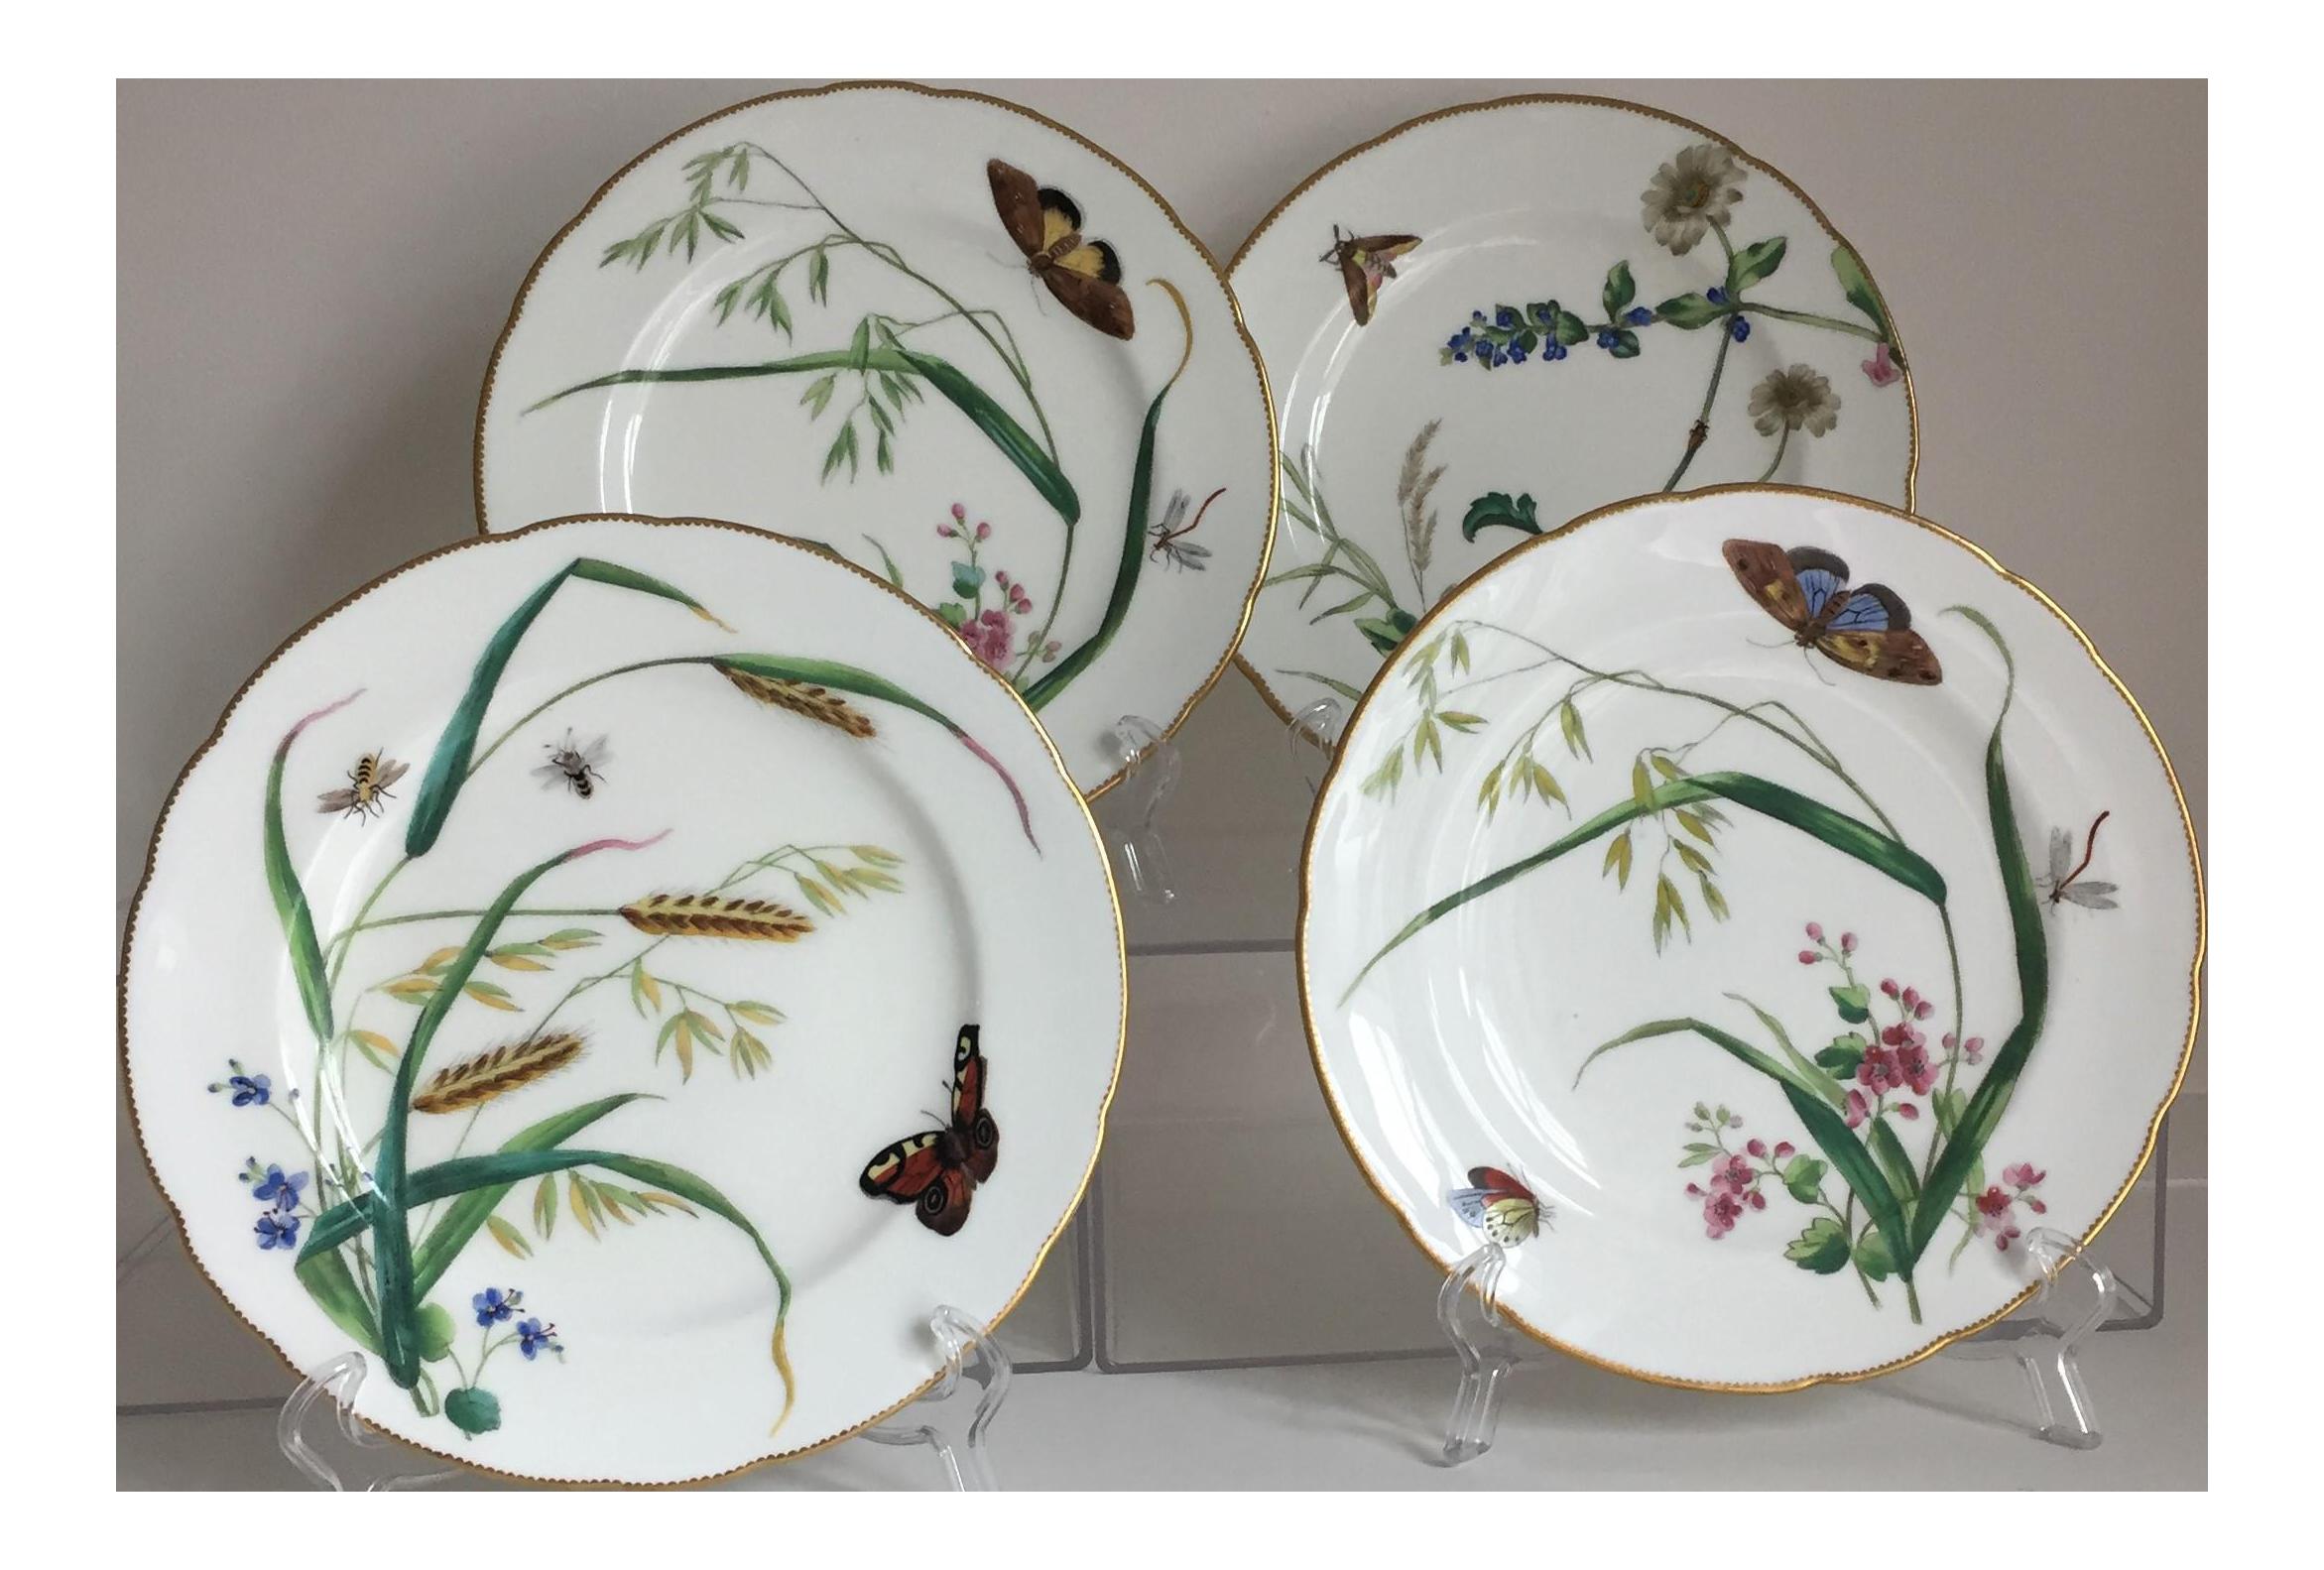 Minton Dessert Plates - Set of 4  sc 1 st  Chairish & Minton Dessert Plates - Set of 4   Chairish